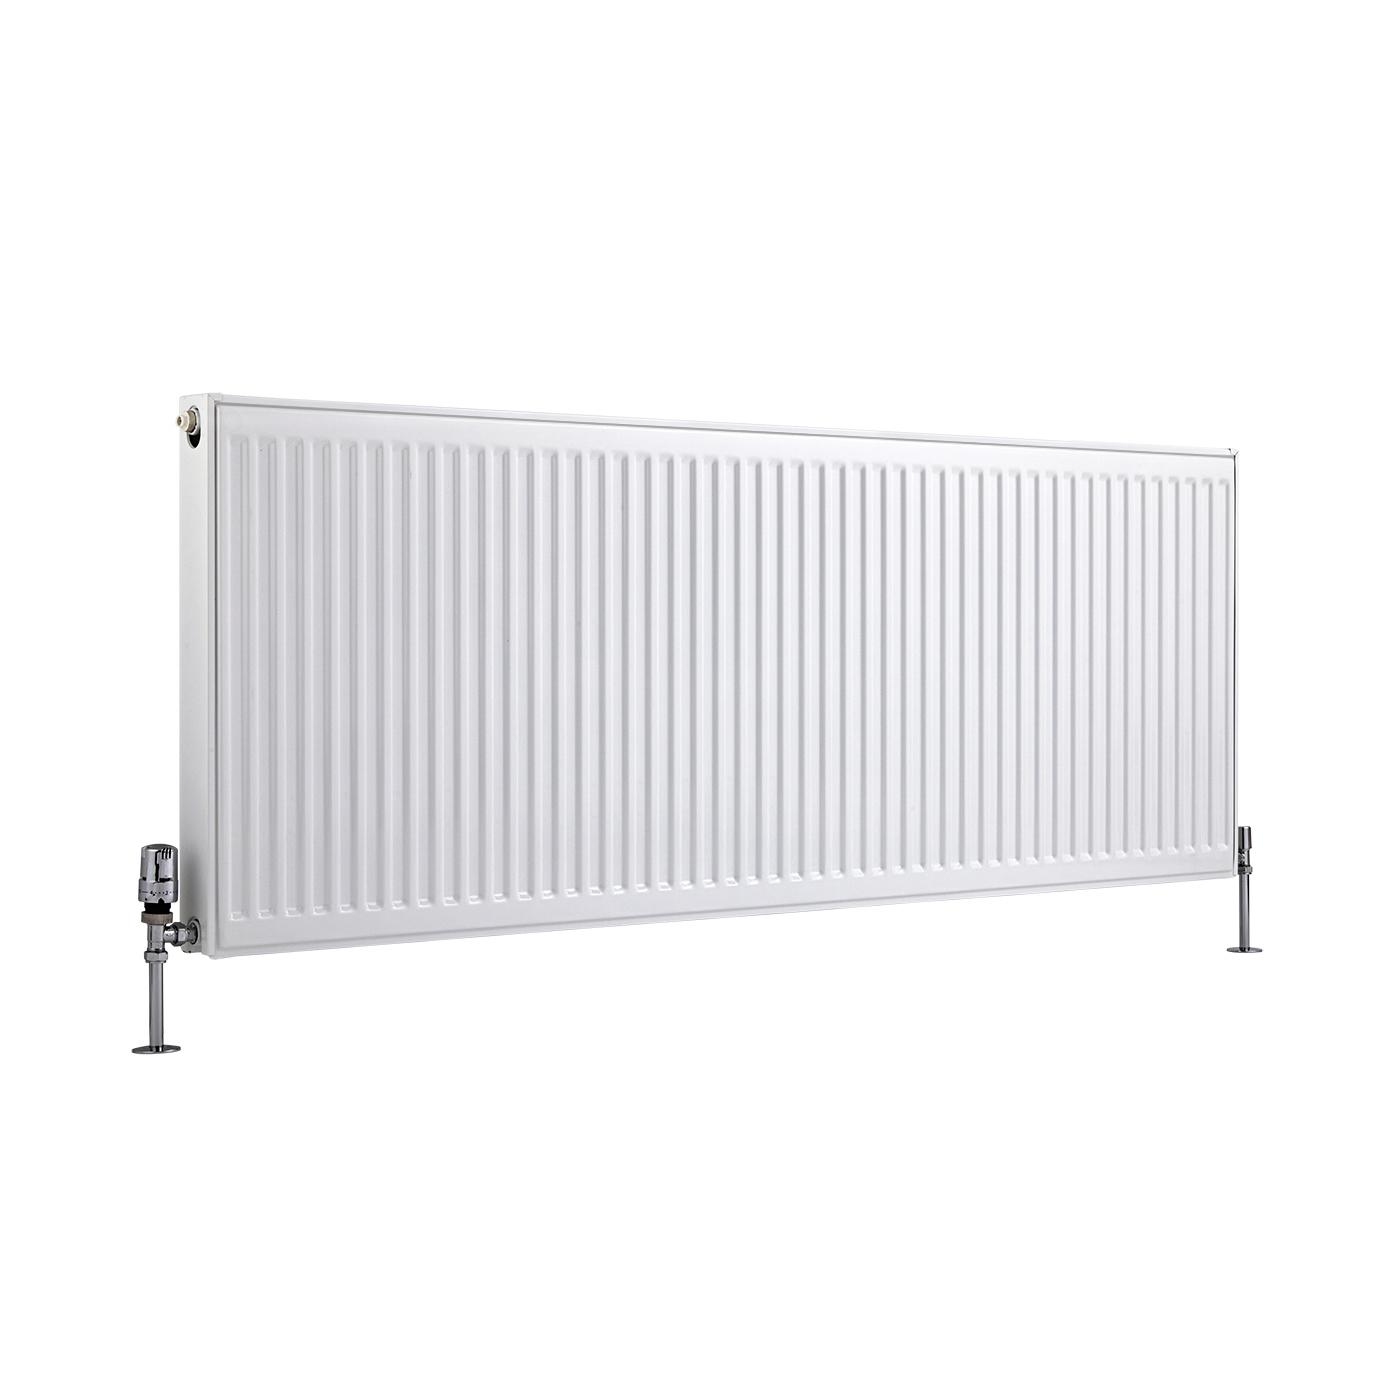 Radiateur À Panneaux Type 21 Horizontal Blanc Eco 60cm x 160cm x 7,3cm 2142 Watts